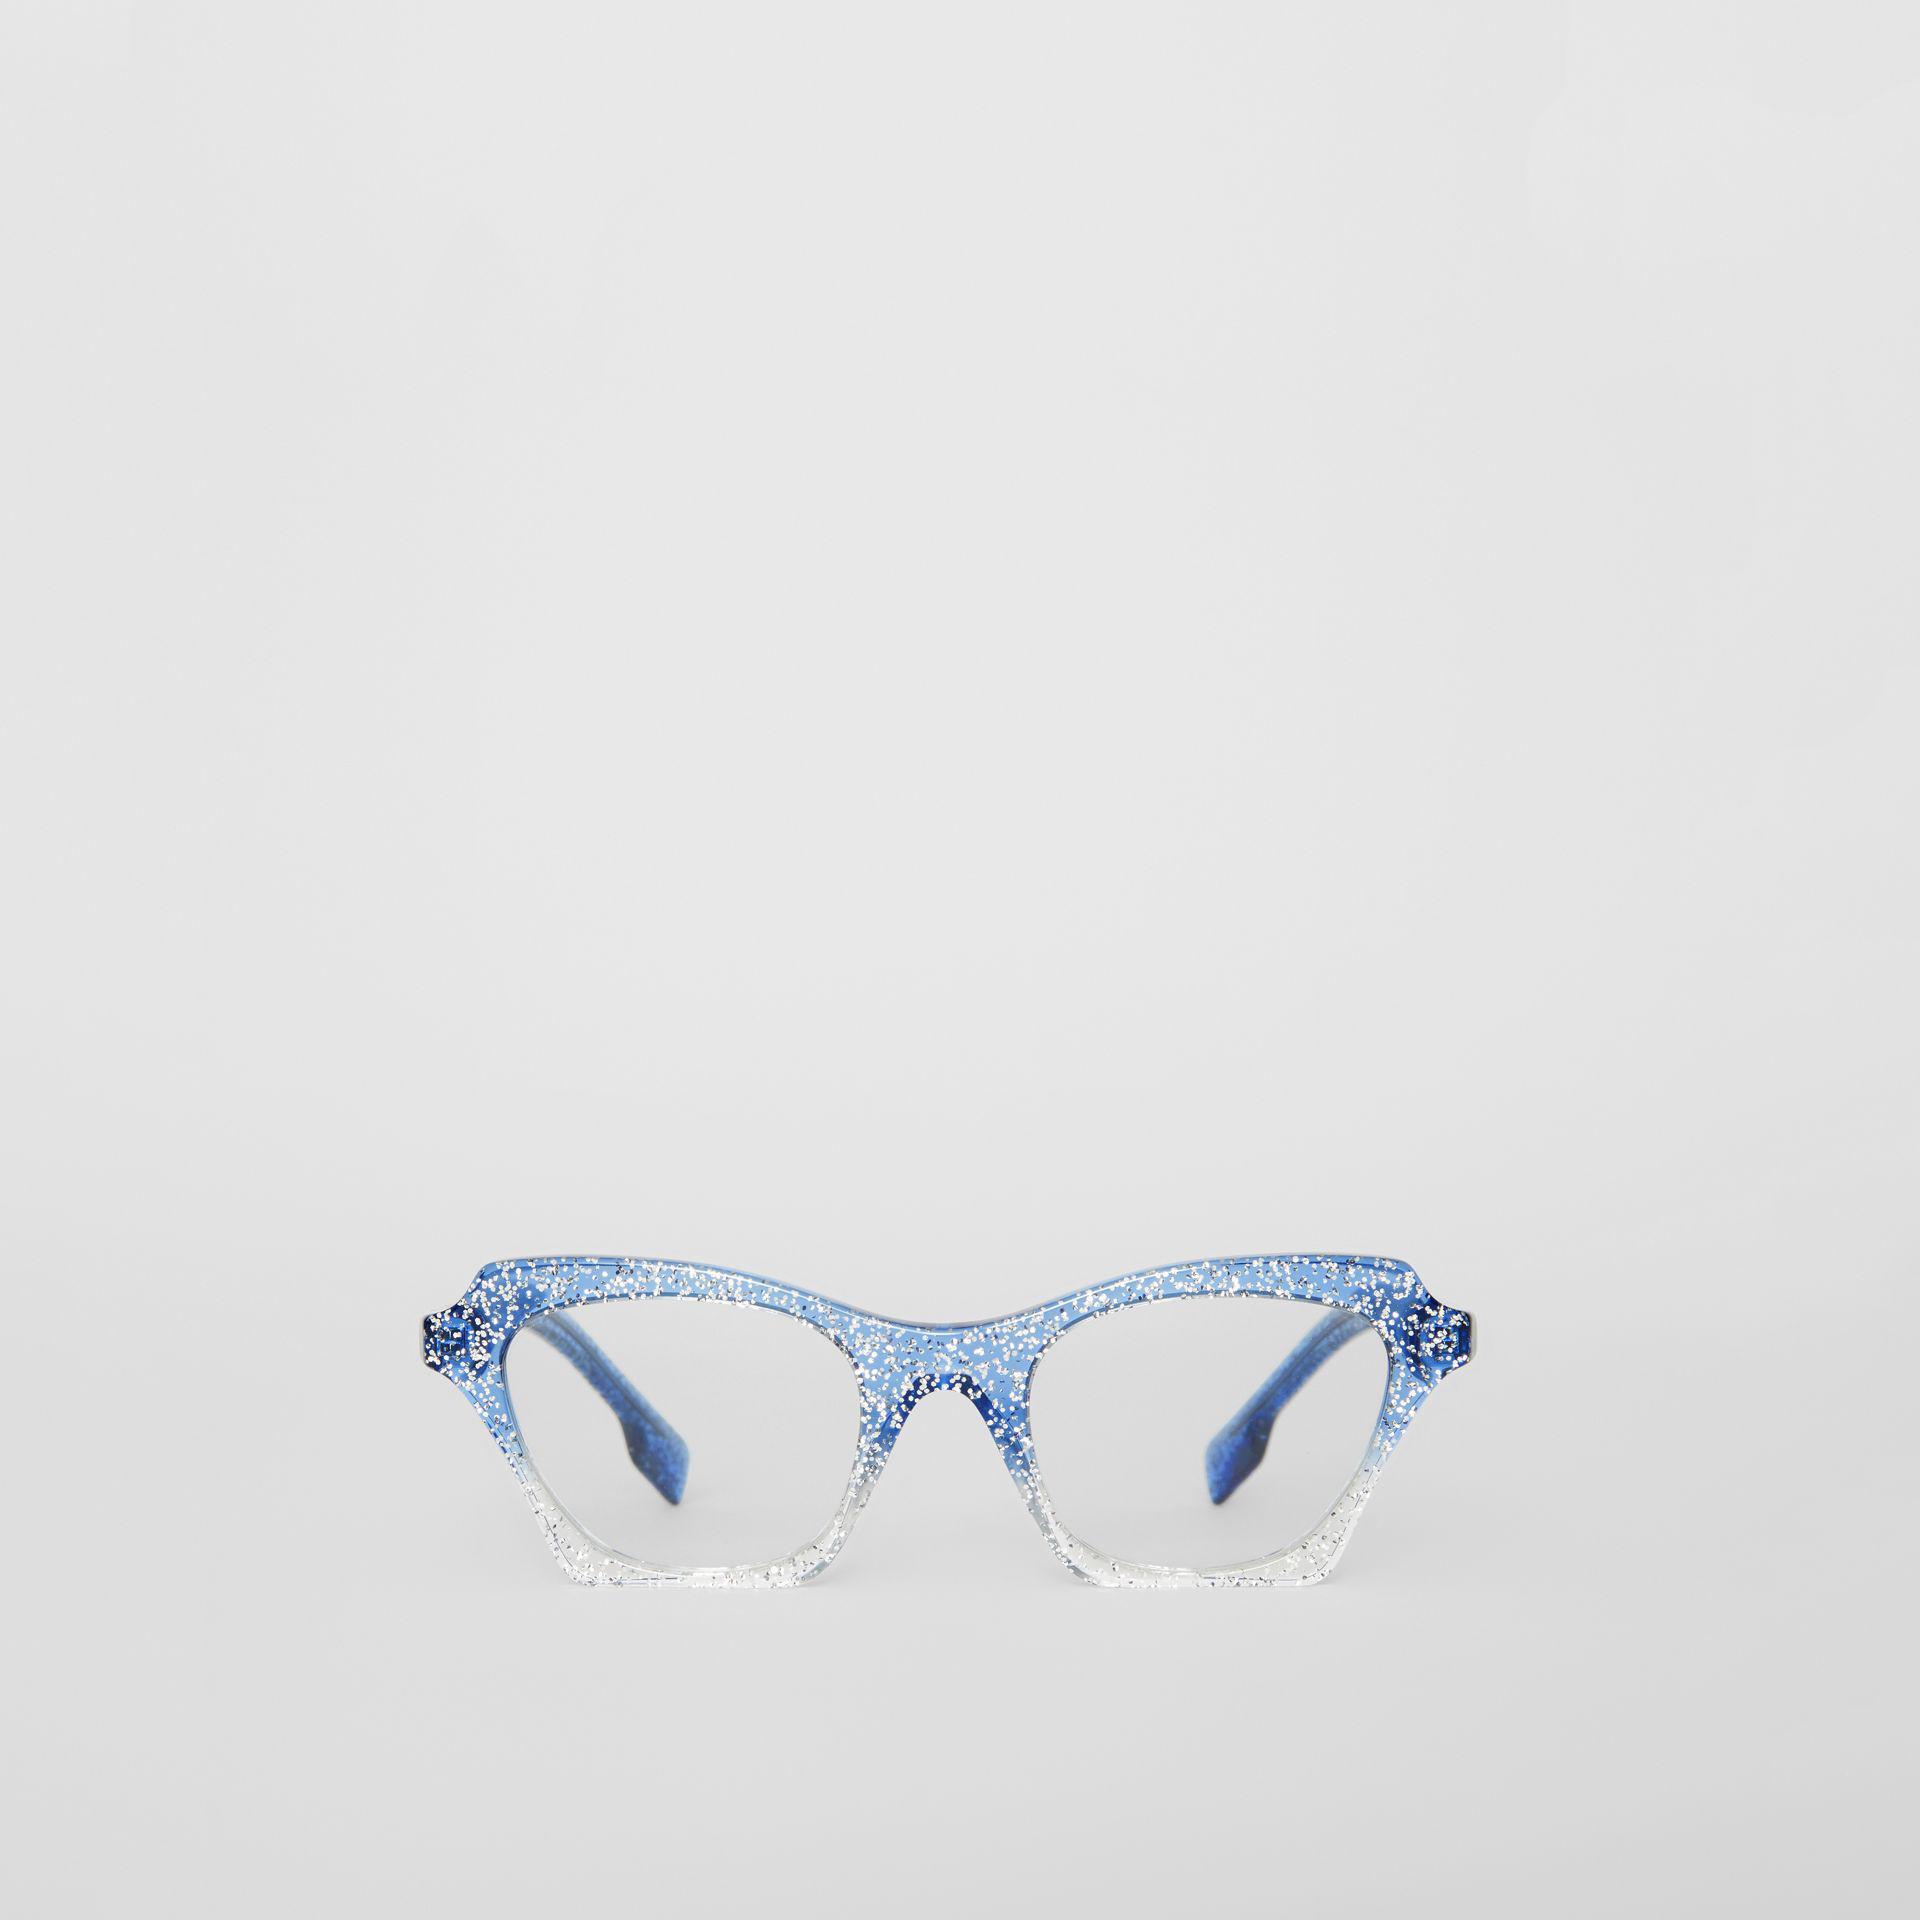 869e433f64d Burberry Glitter Detail Butterfly Optical Frames in Blue - Lyst